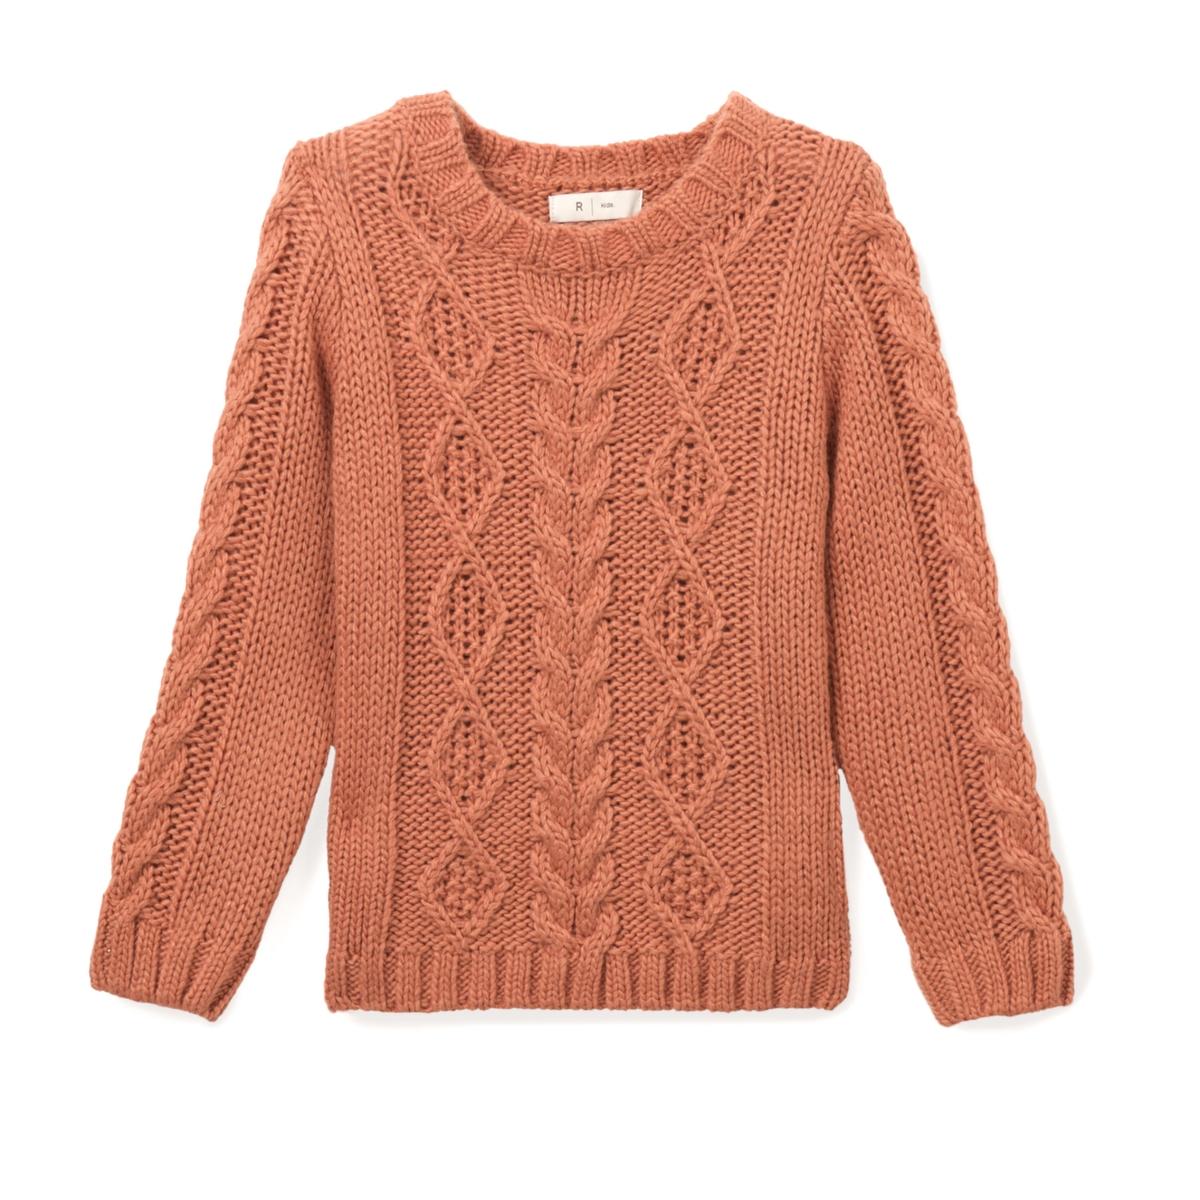 Пуловер из витого трикотажа 3-12 лет